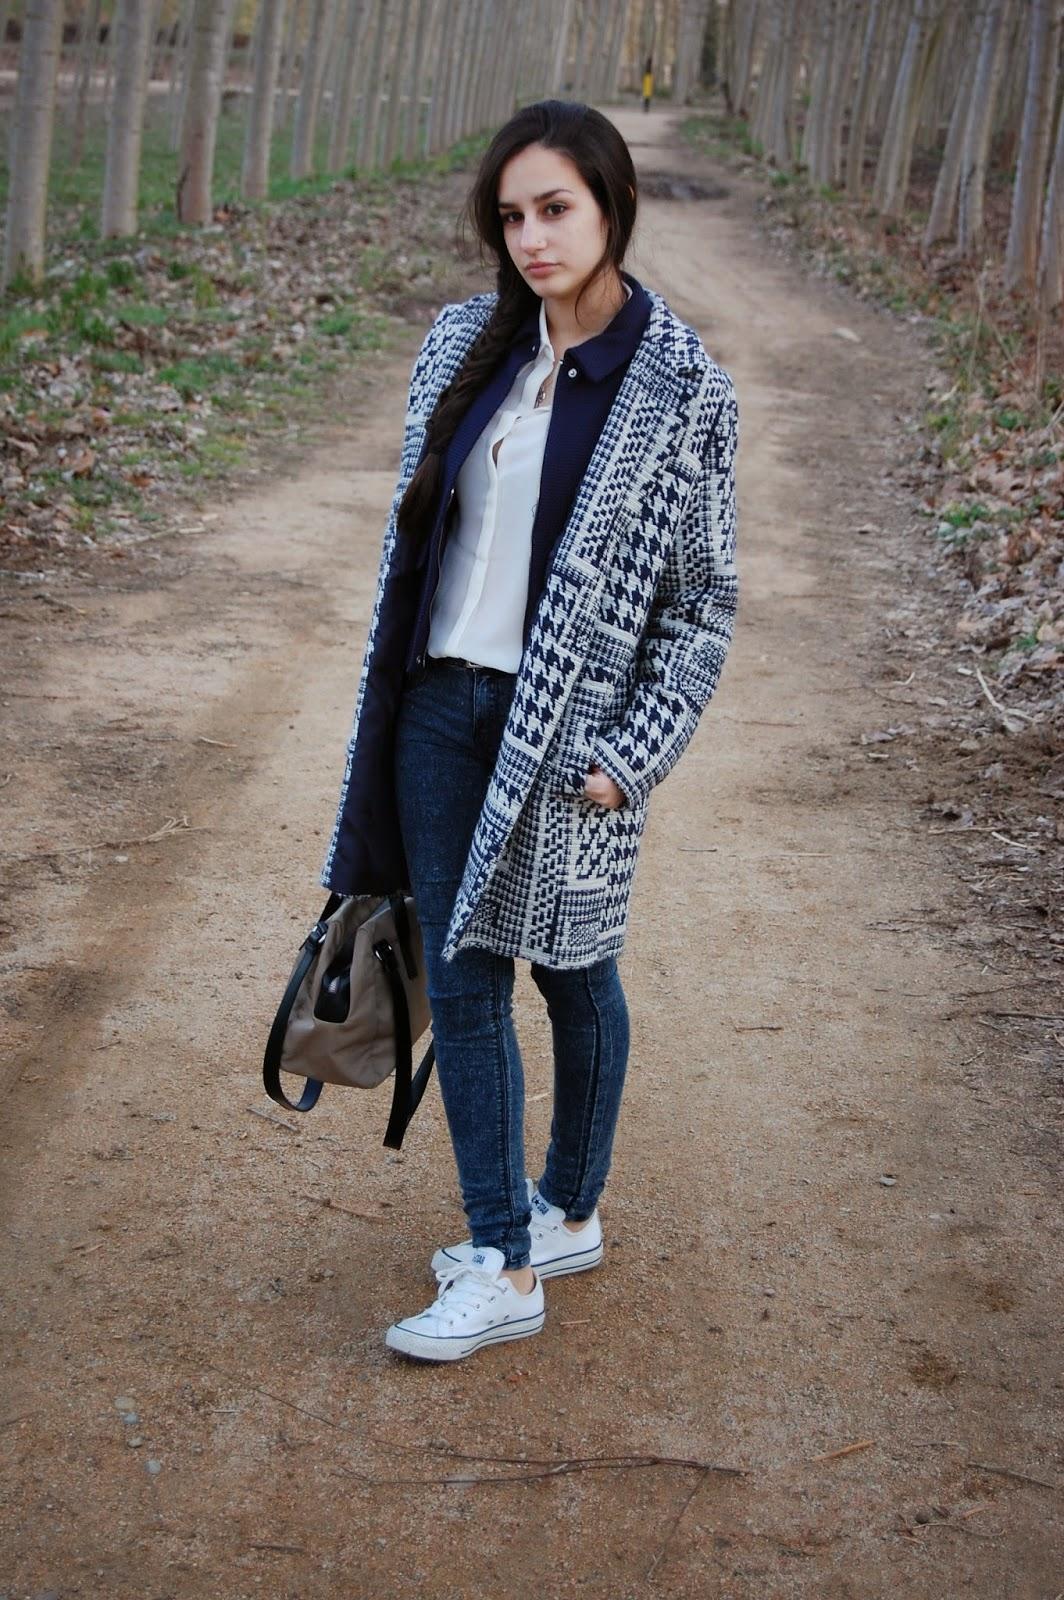 abrigo azul zara, chaqueta azul zara, camisa blanca mango, jeans azul zara, zapatillas converse blancas, reloj michael kors, bufanda zara, bolso bimba&lola beige